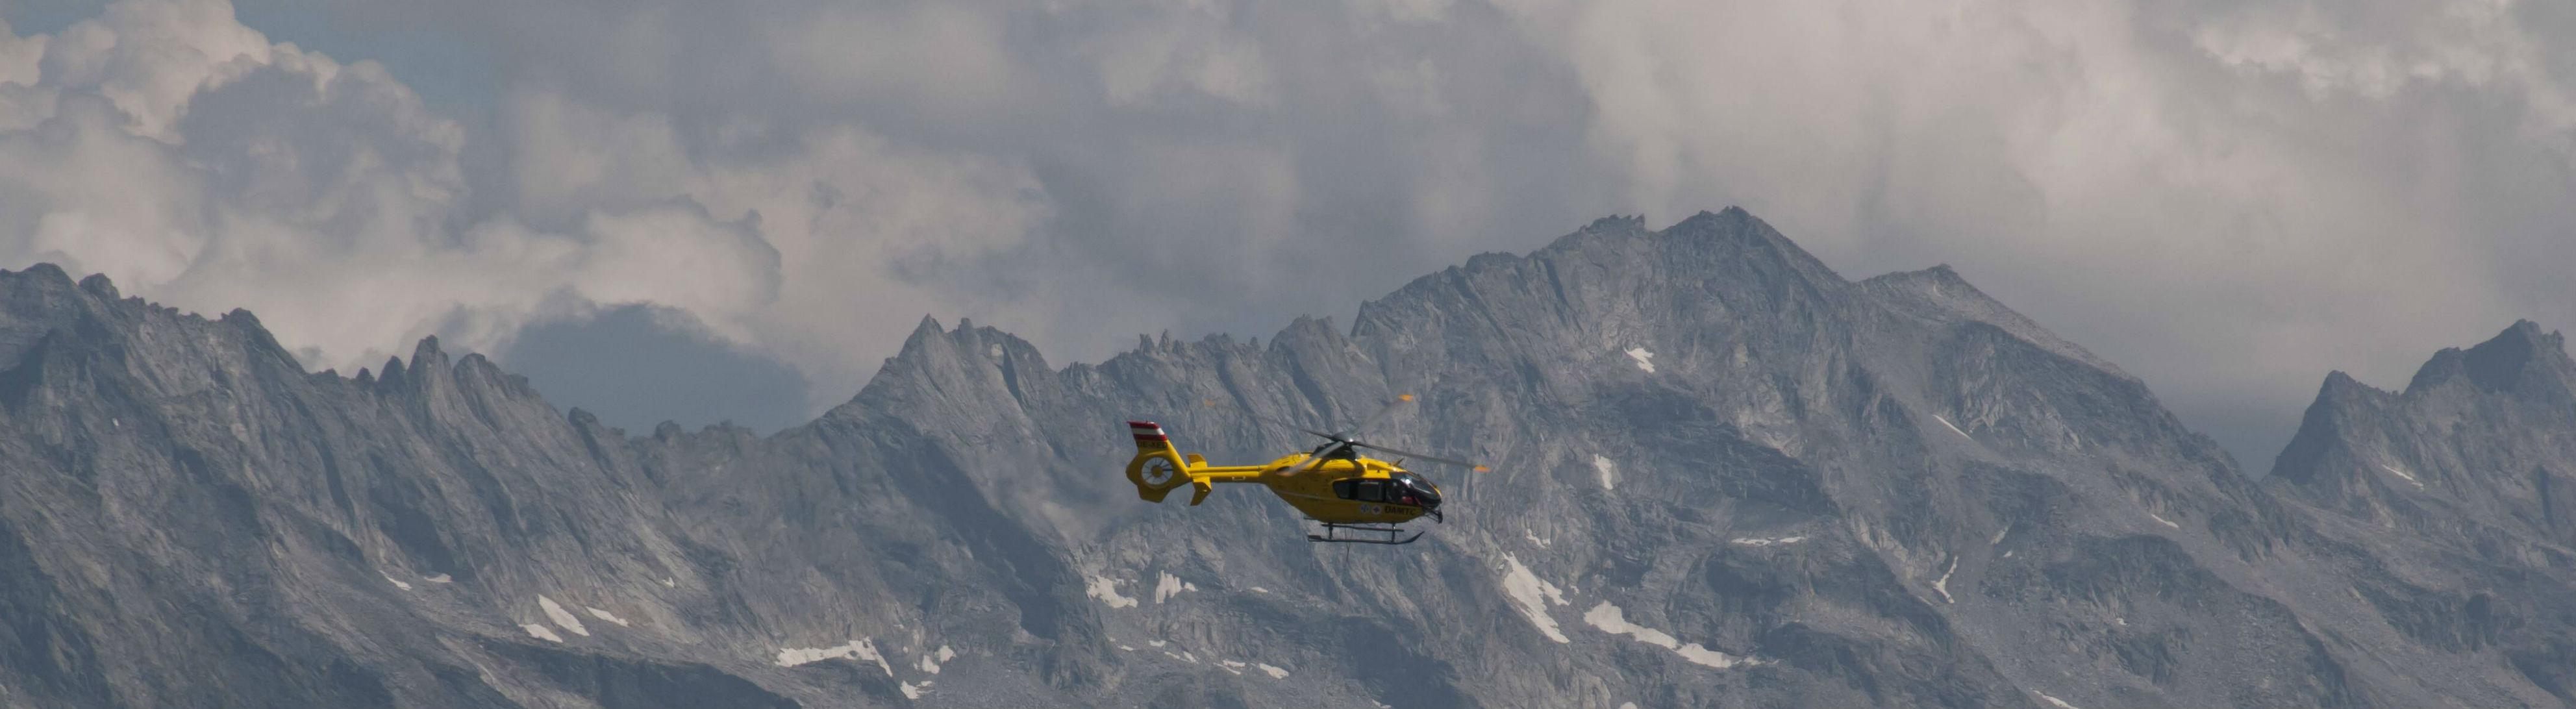 Bergretter-Hubschrauber in den Tuxer Aplen in Tirol.